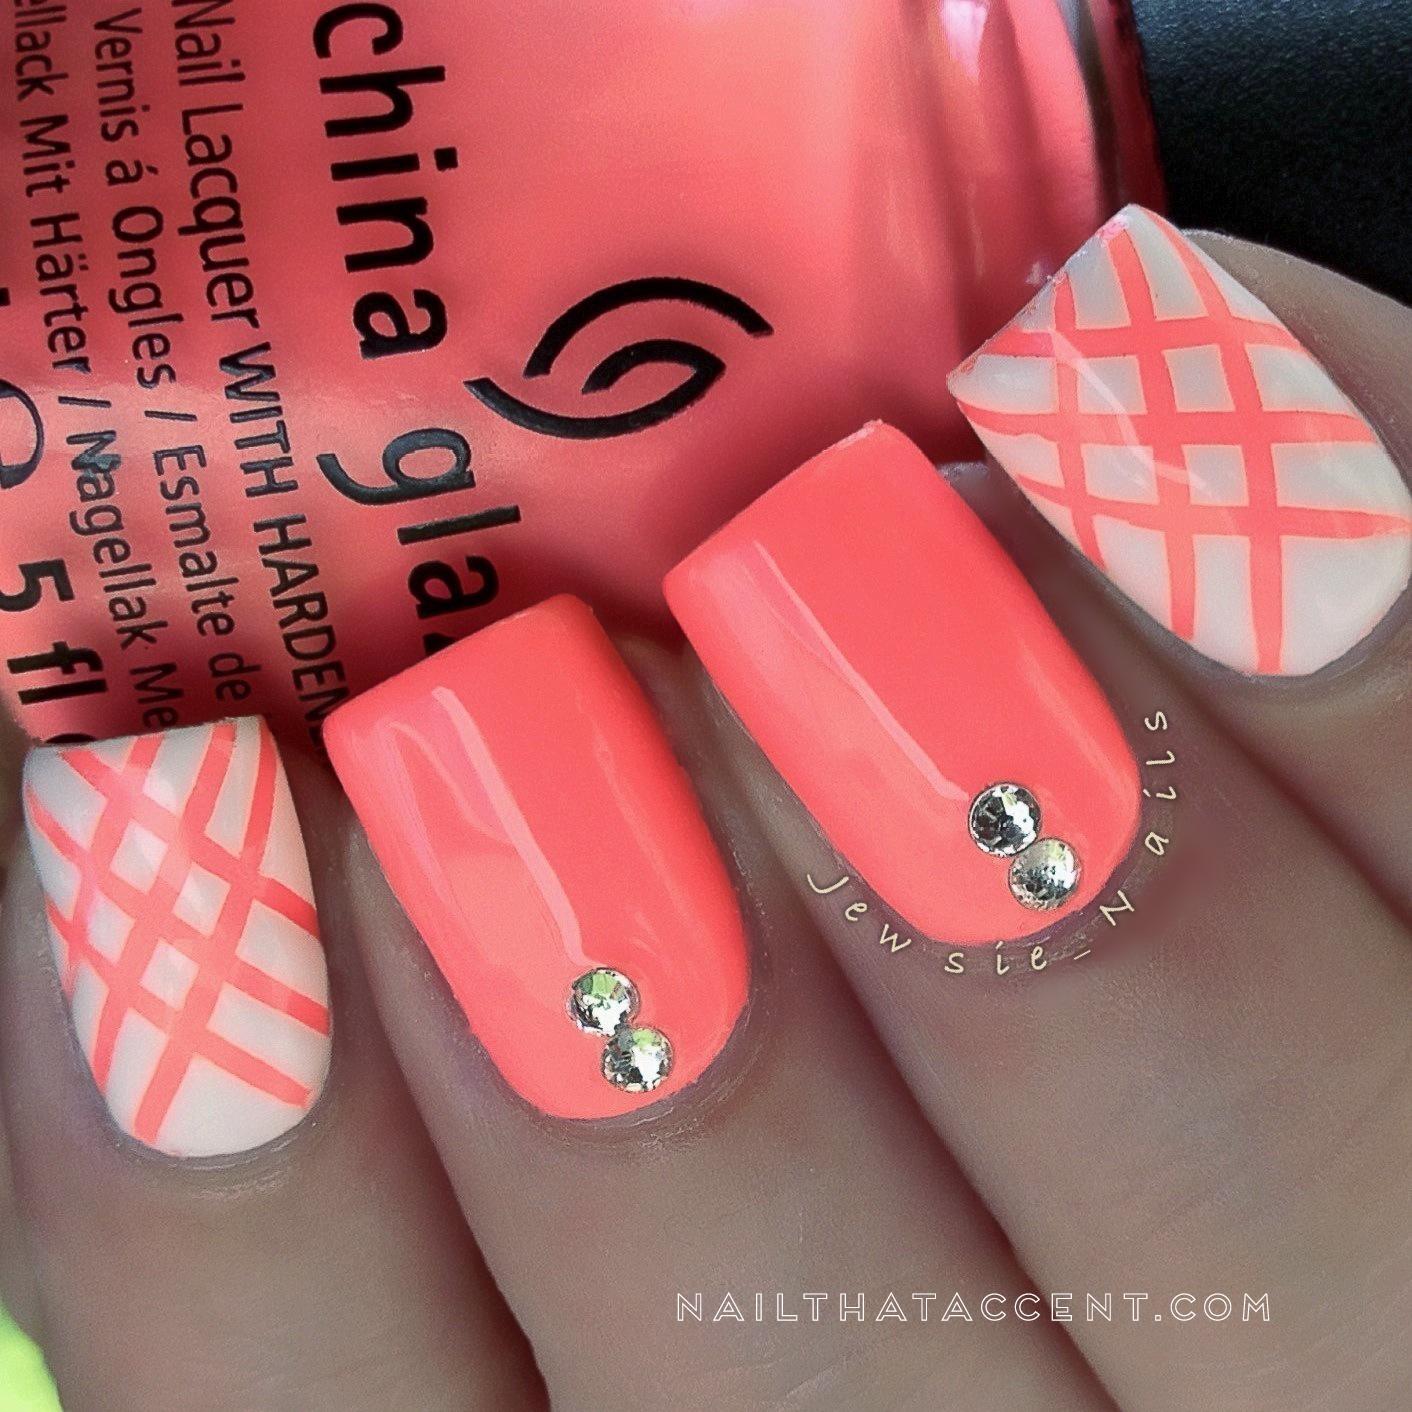 Nail Art #212 - Best Nail Art Designs Gallery | Tape nail art, Tape ...